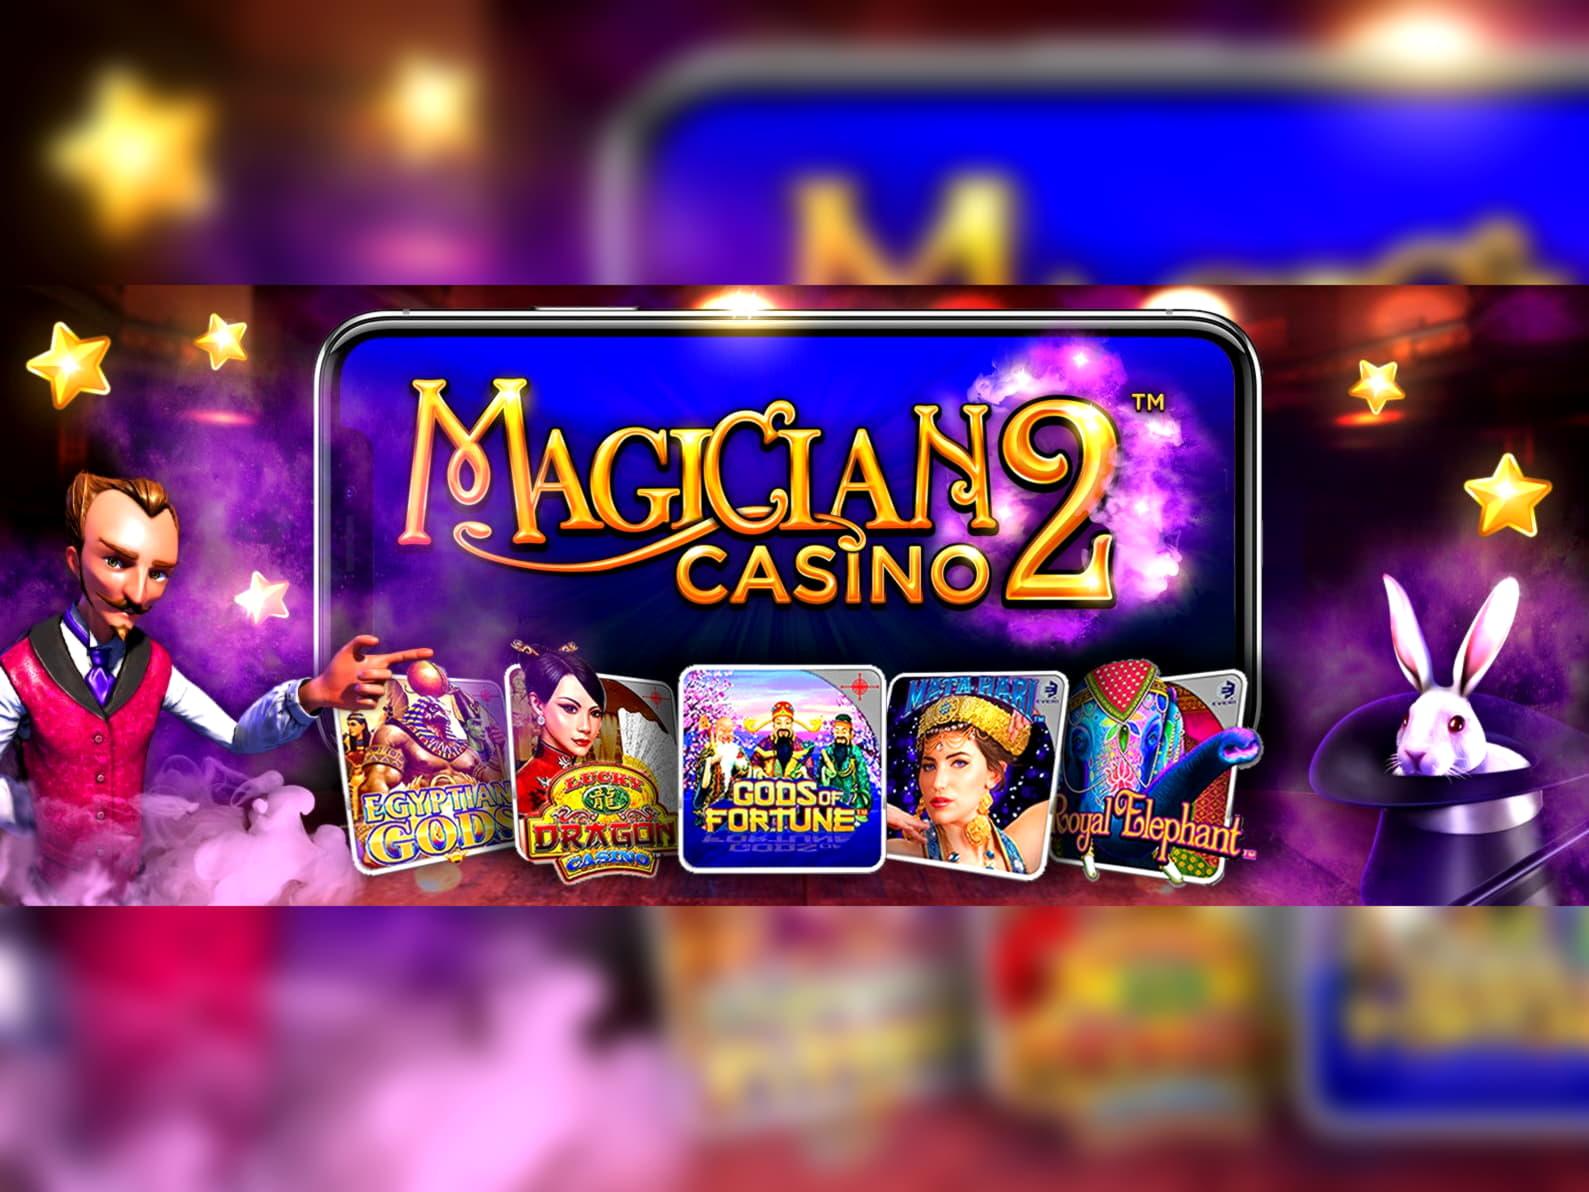 190 Free Spins Casino at Wix Stars Casino